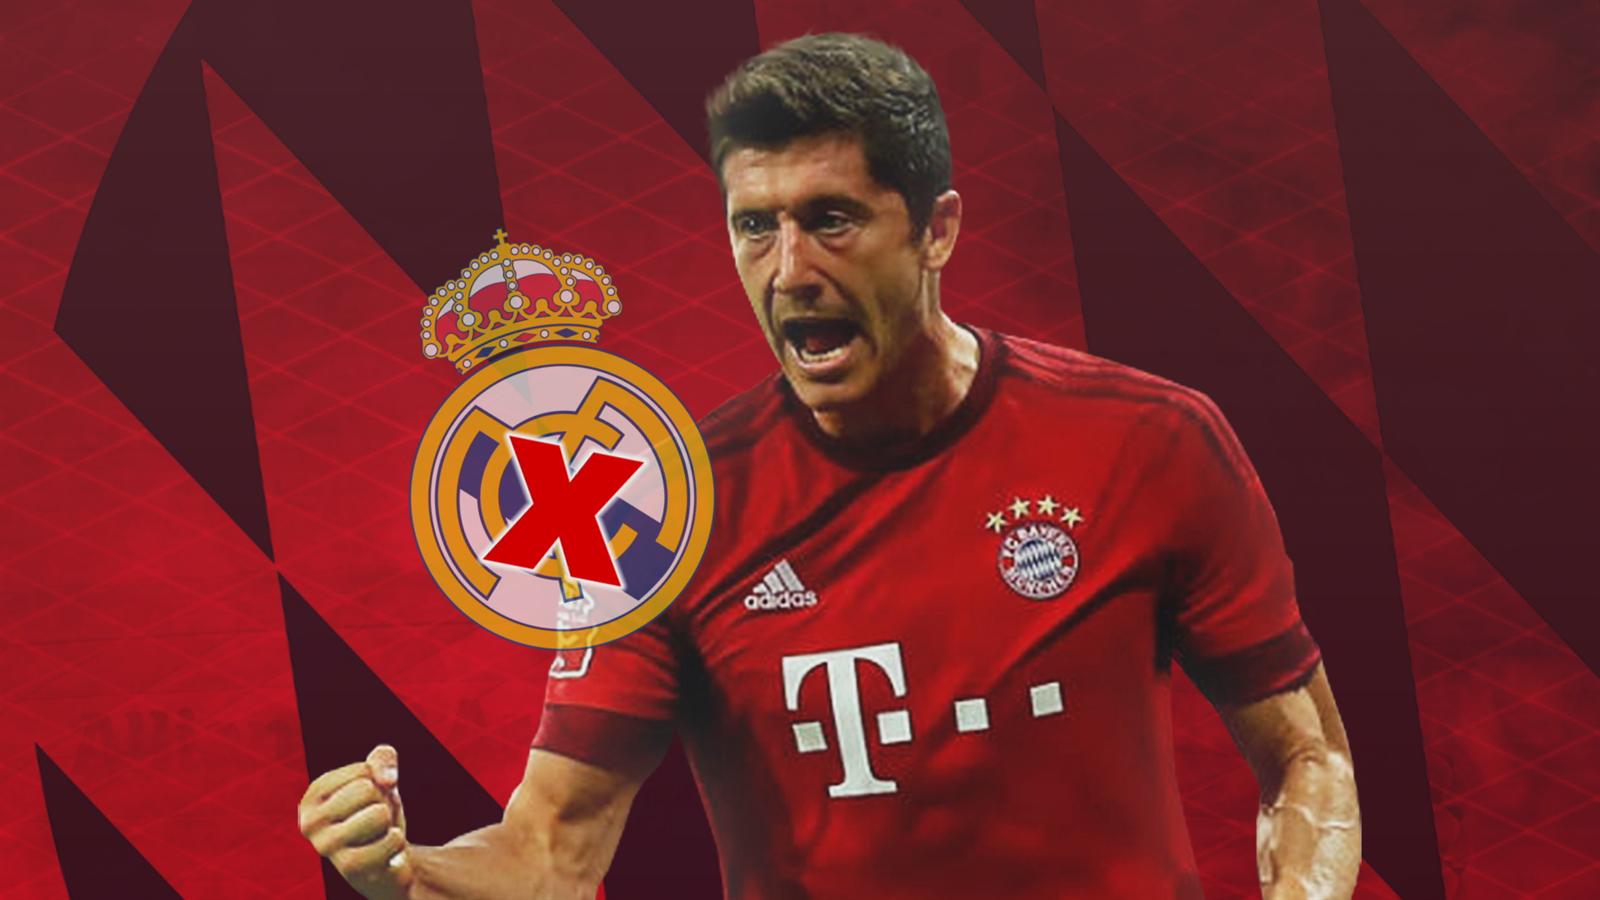 Ancelotti demands that Lewandowski stays at Bayern - Euro Papers